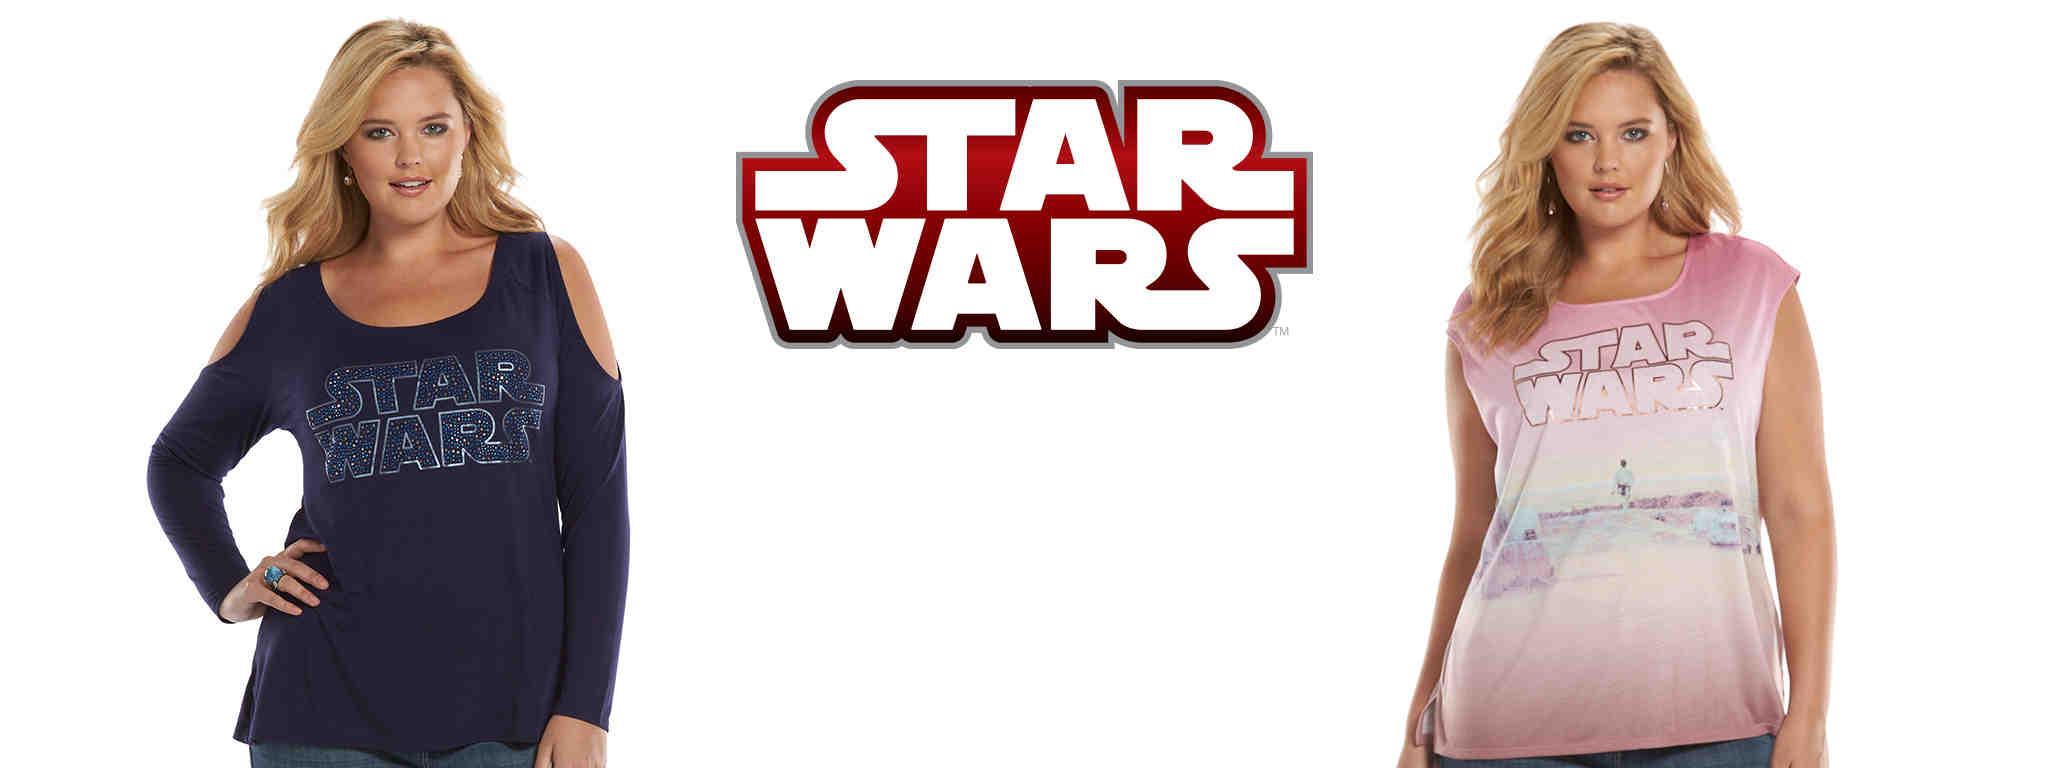 Star Wars Plus Size Clothing